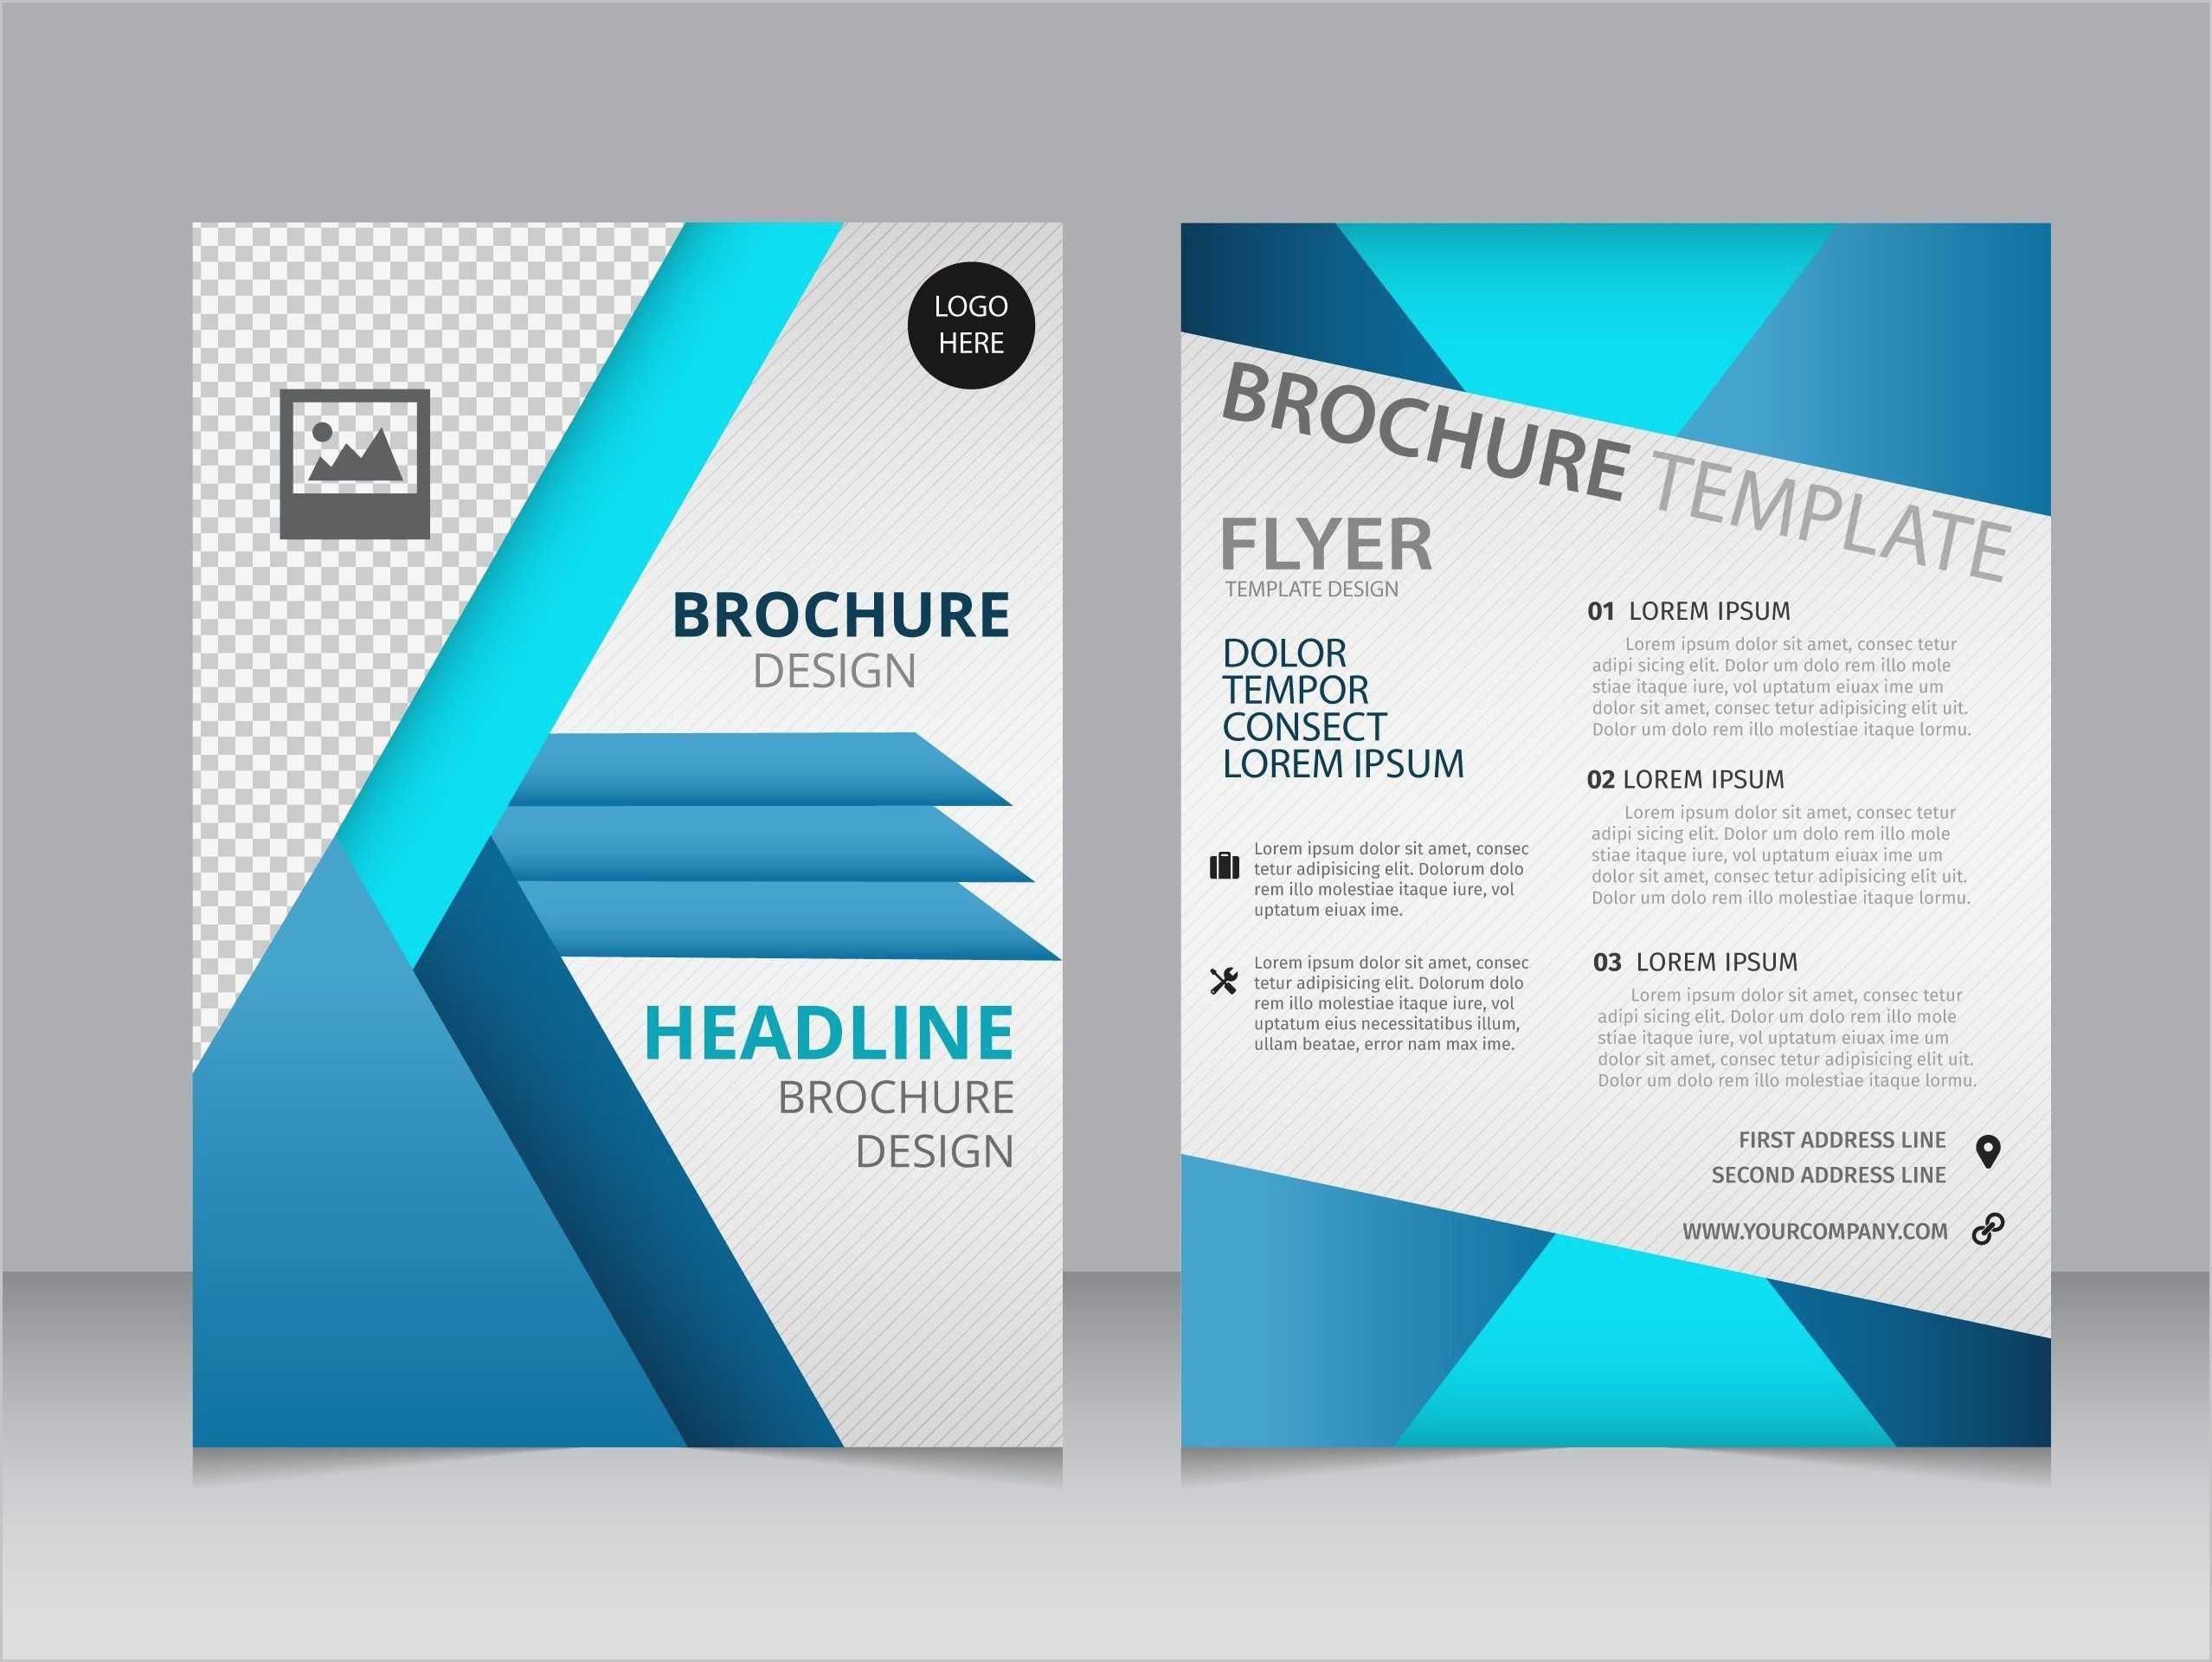 016 Microsoft Word Brochure Template Free Download Ideas For In Microsoft Word Brochure Template Free